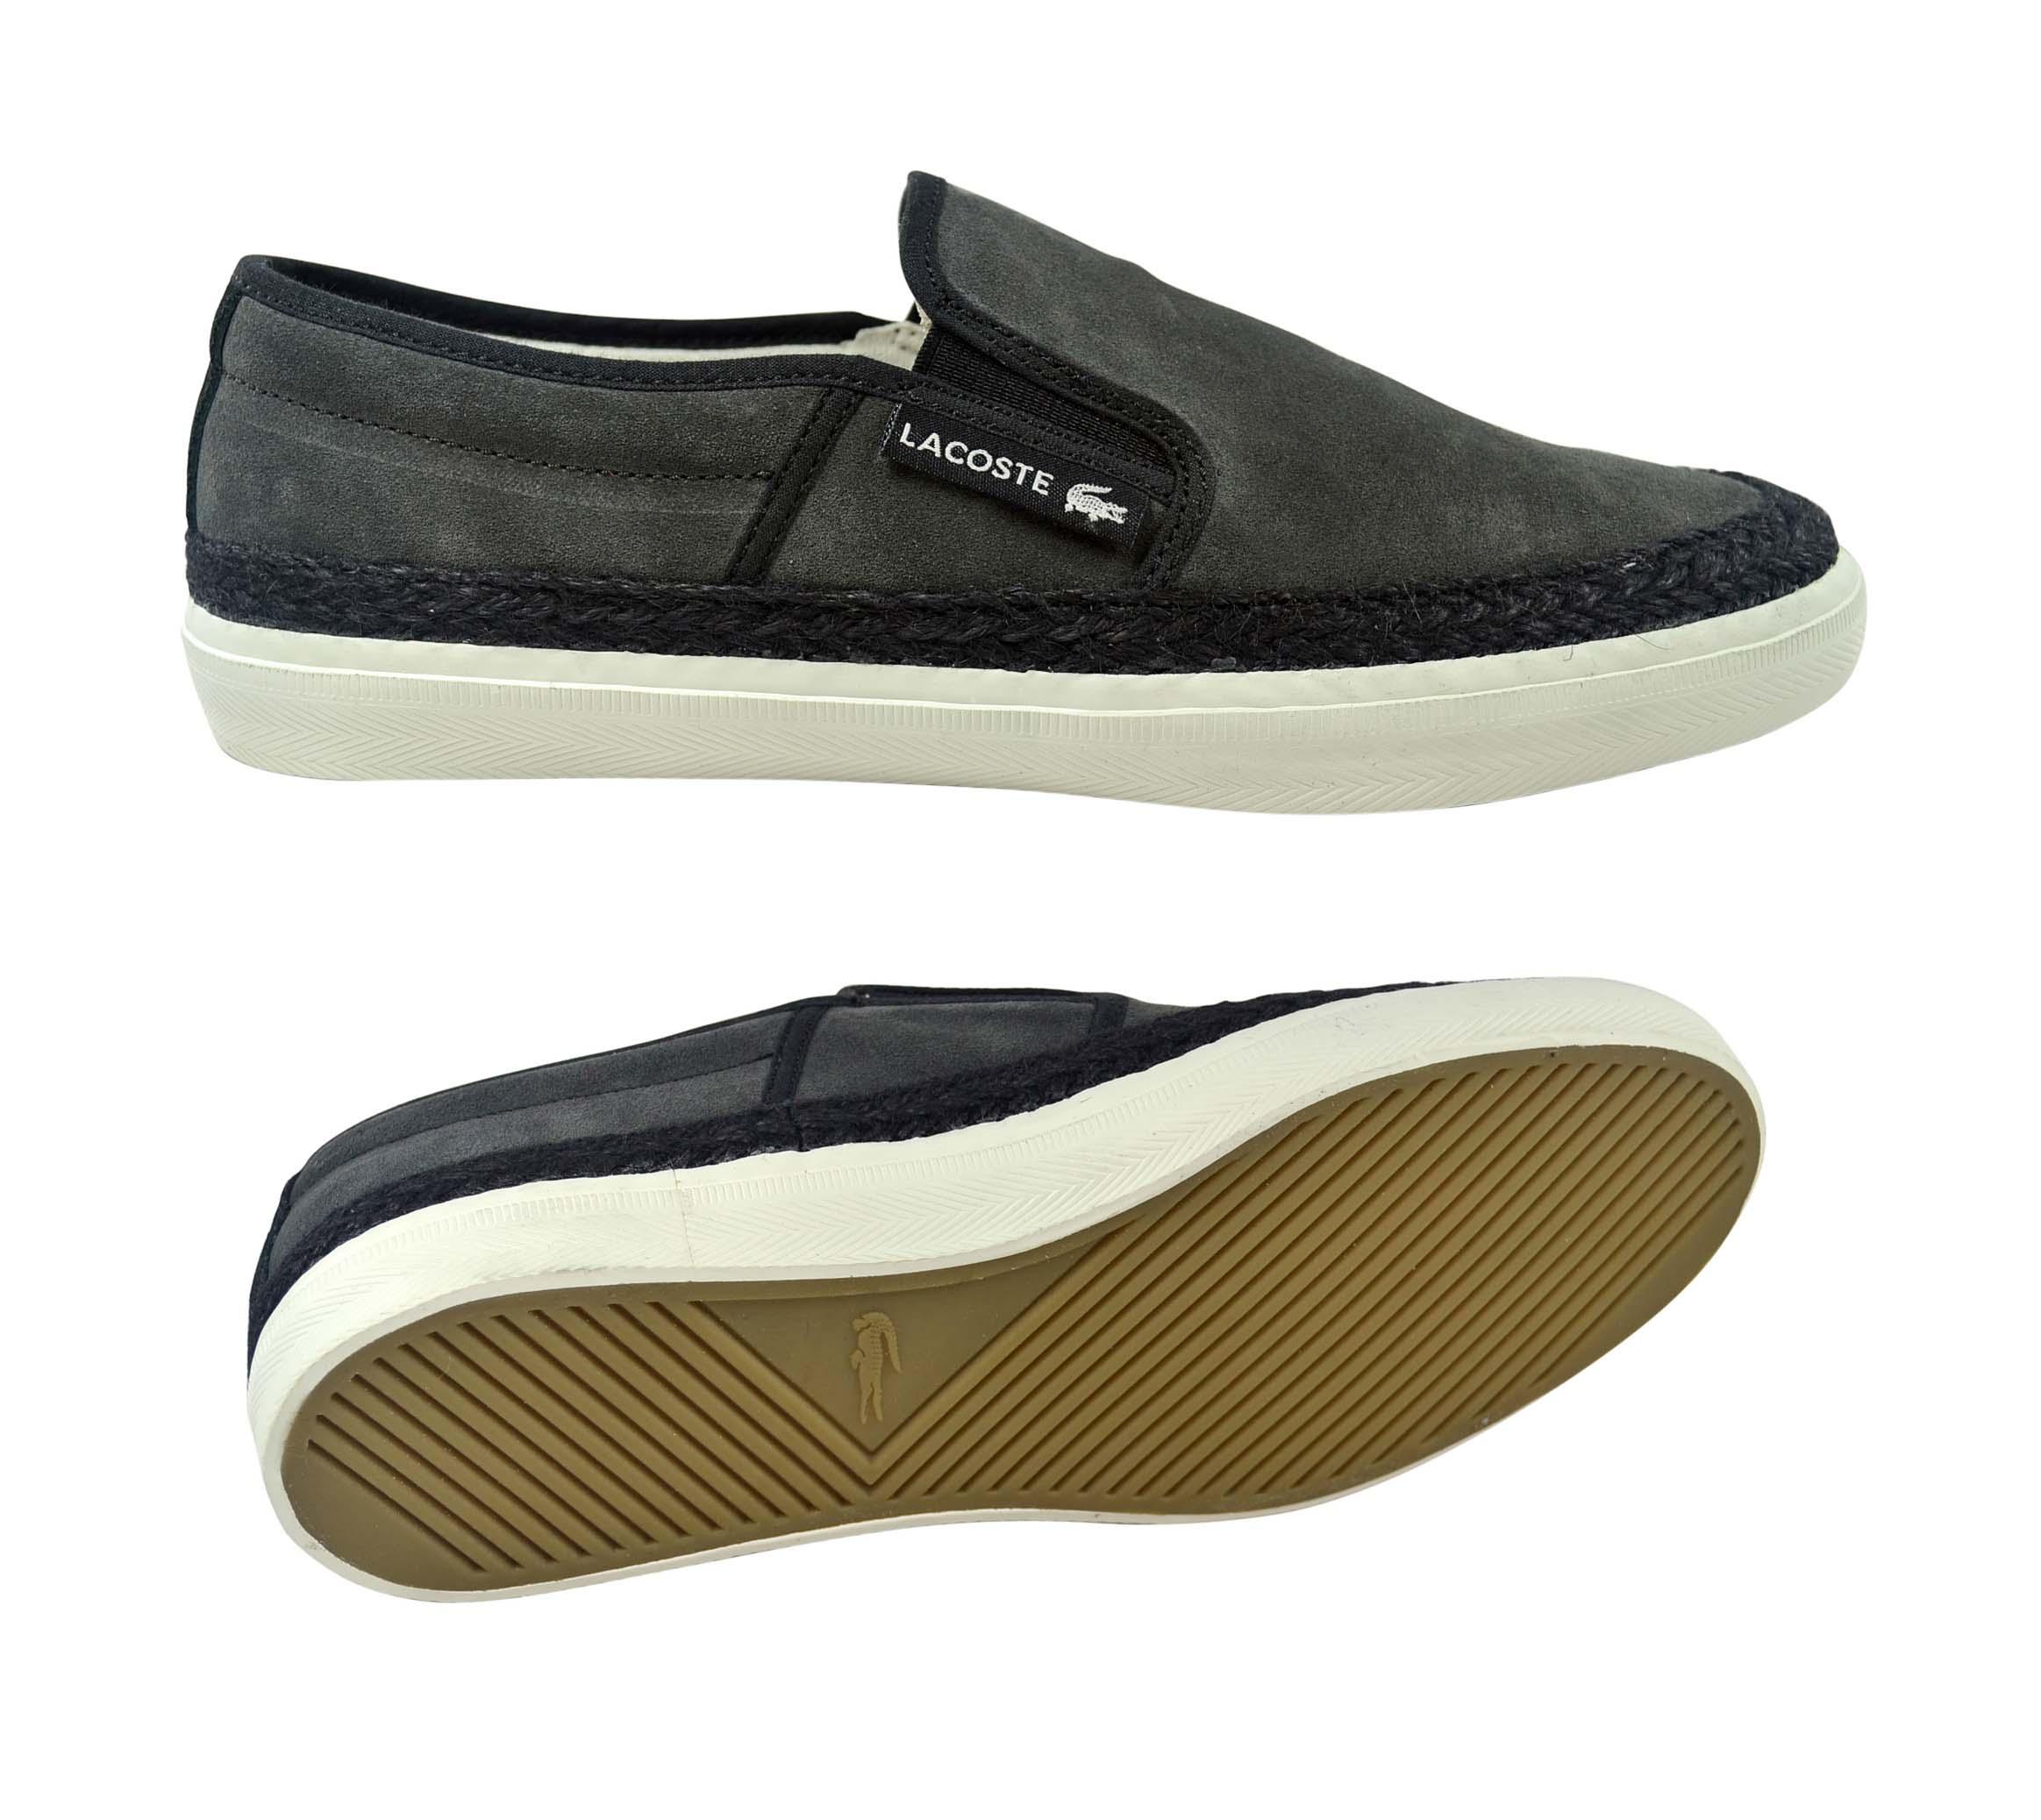 lacoste gazon 2 srm dark grey brown off white slipper. Black Bedroom Furniture Sets. Home Design Ideas